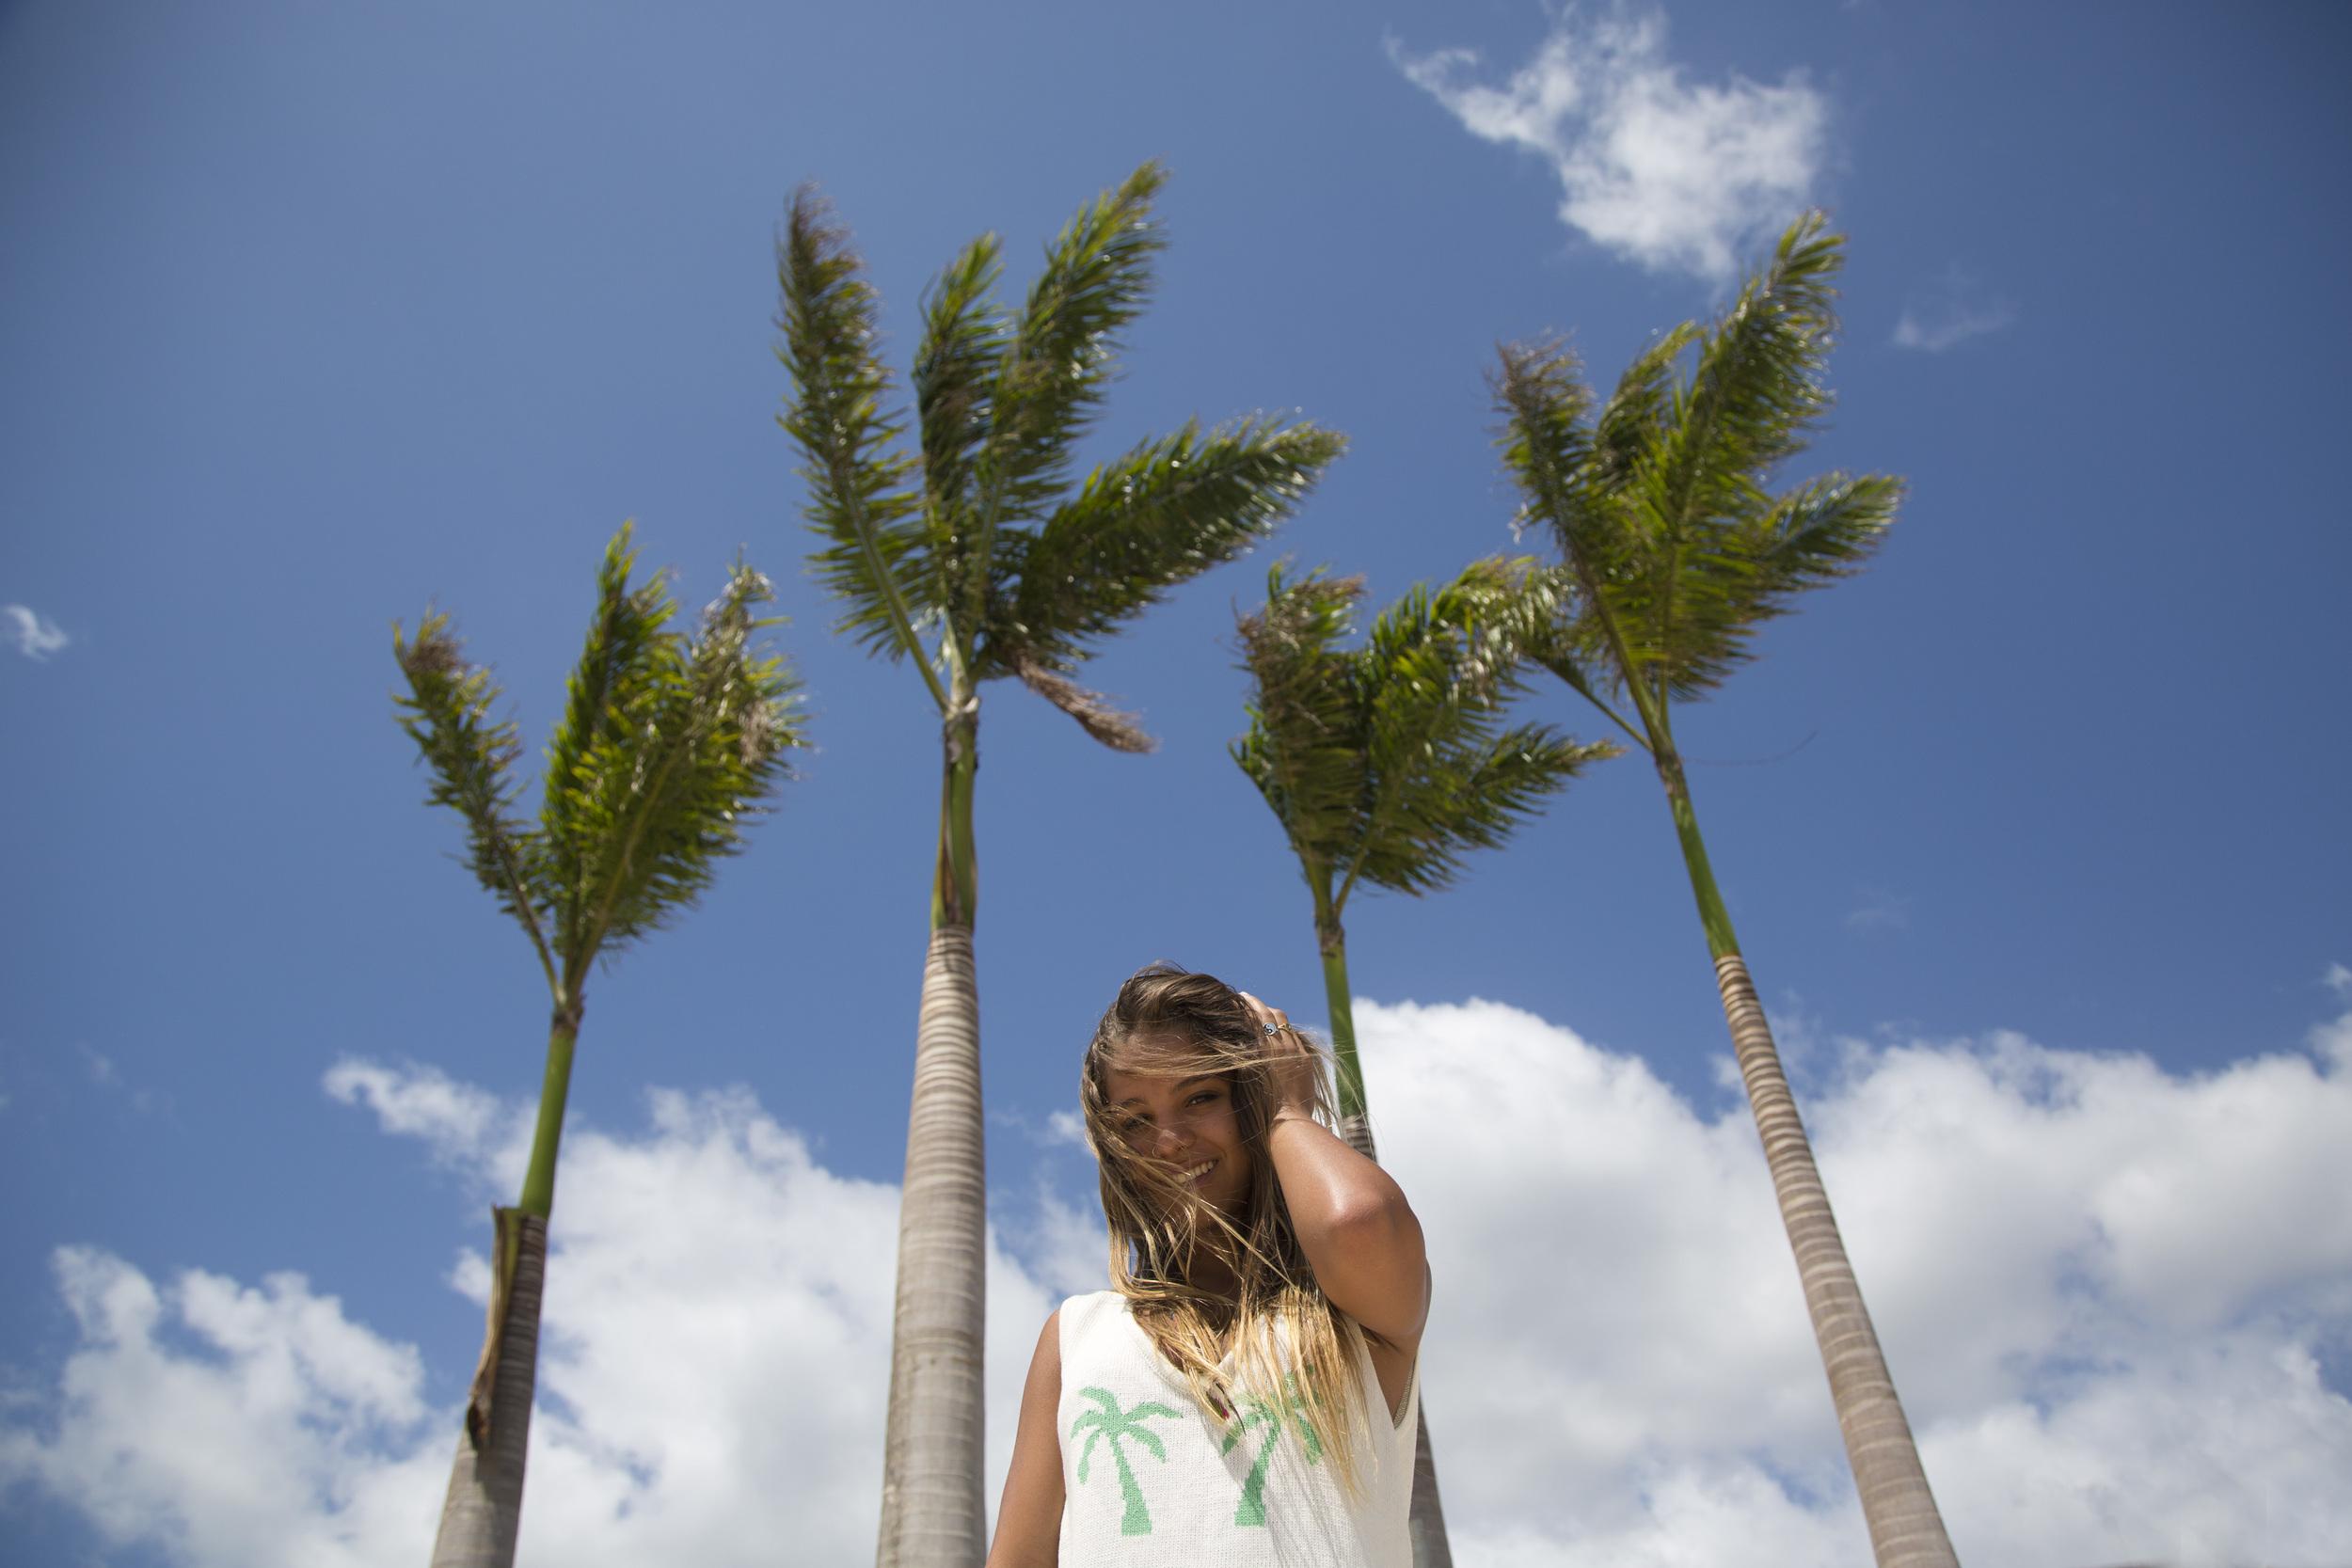 LILYA - PALM TREES 30 DEGREES